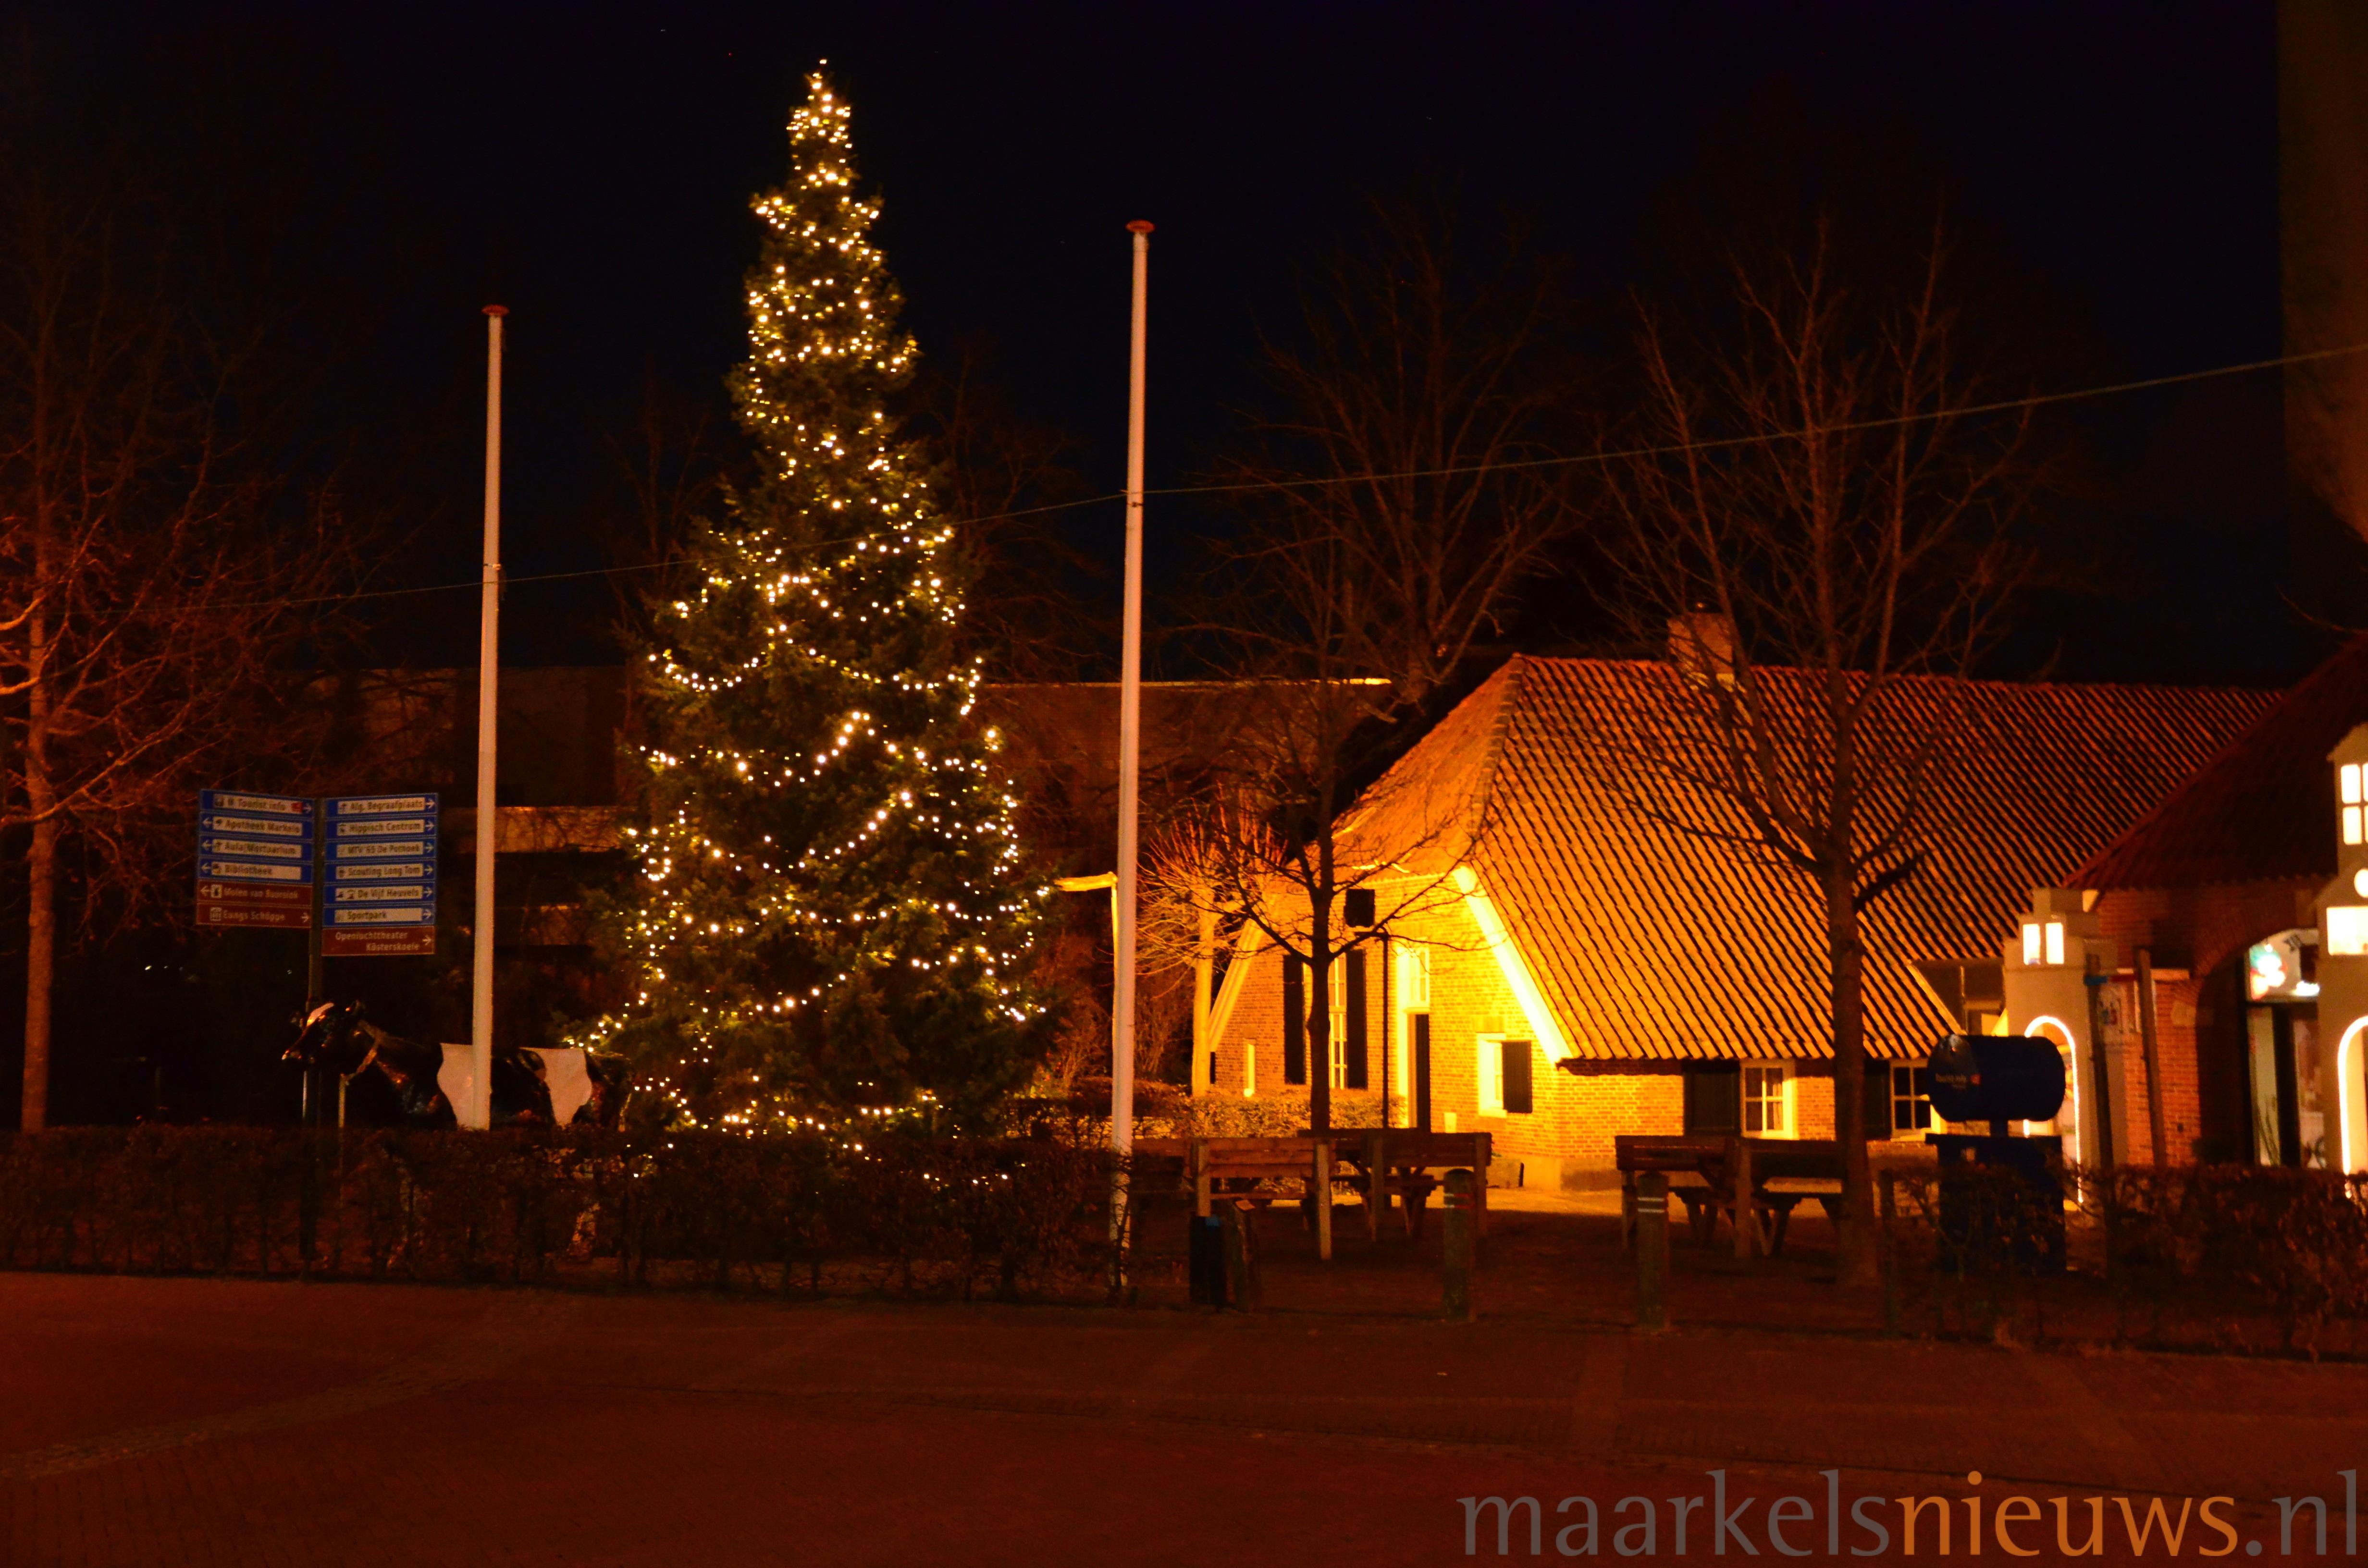 Kerstboom dit jaar op Kaasplein - Maarkelsnieuws.nl